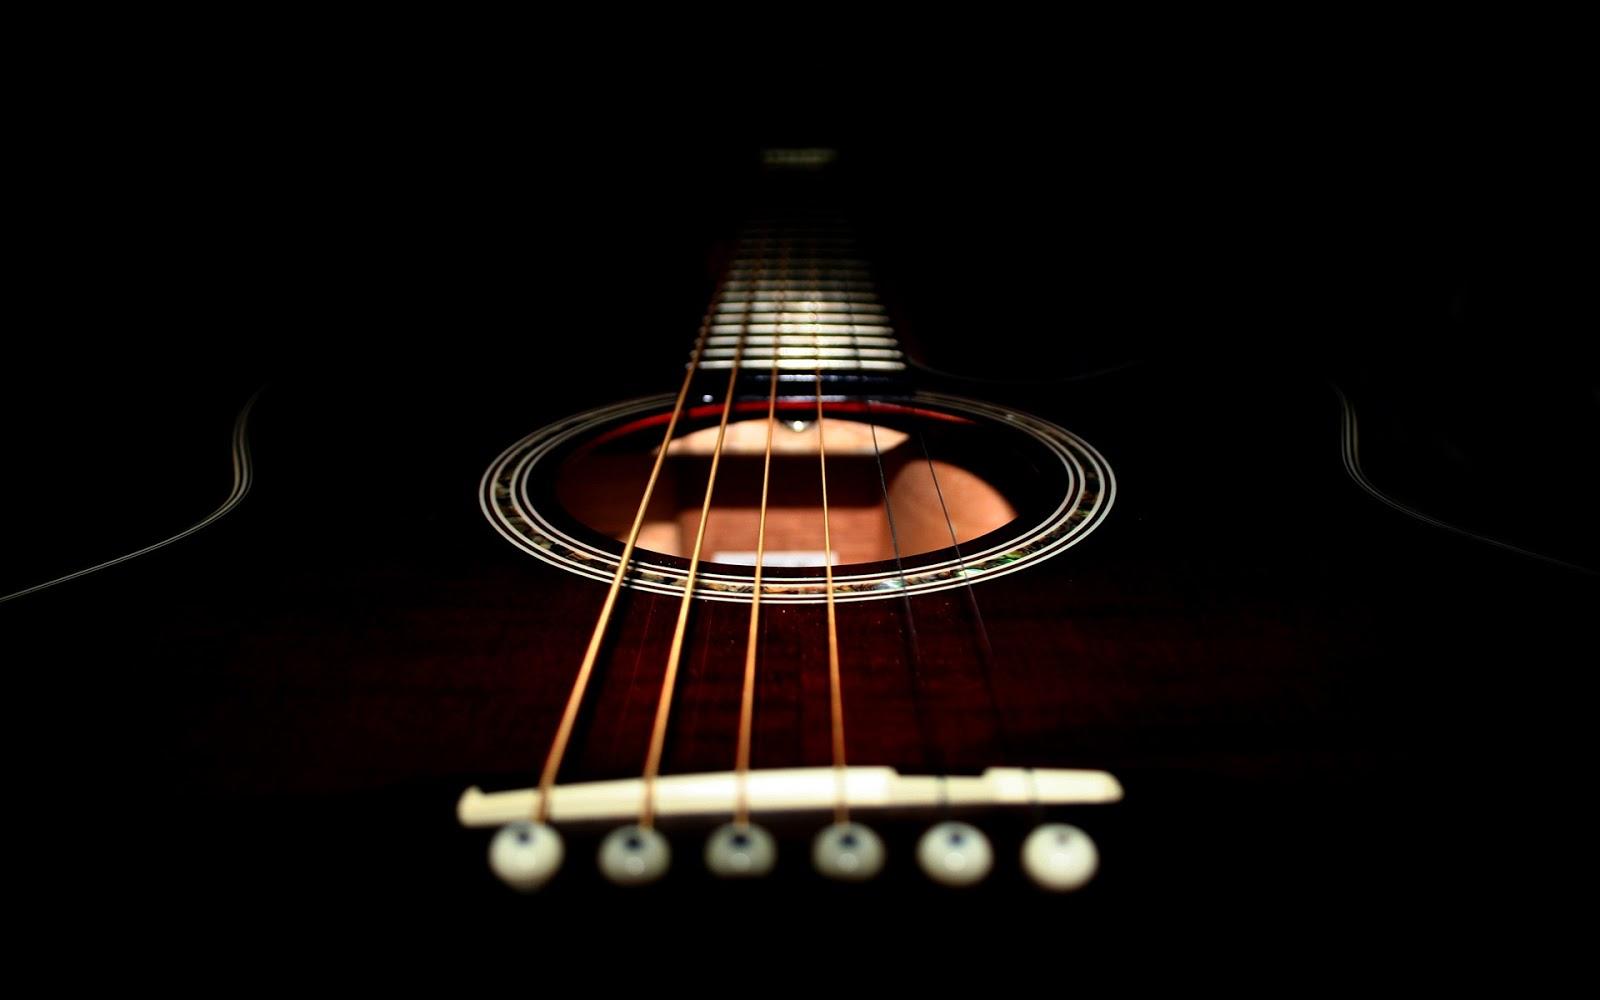 http://3.bp.blogspot.com/--RN7gODXGNo/UVSgLXR6yLI/AAAAAAAADYc/VsVKr_D_H7k/s1600/Guitar-iPhone-HD-Wallpaper.jpg